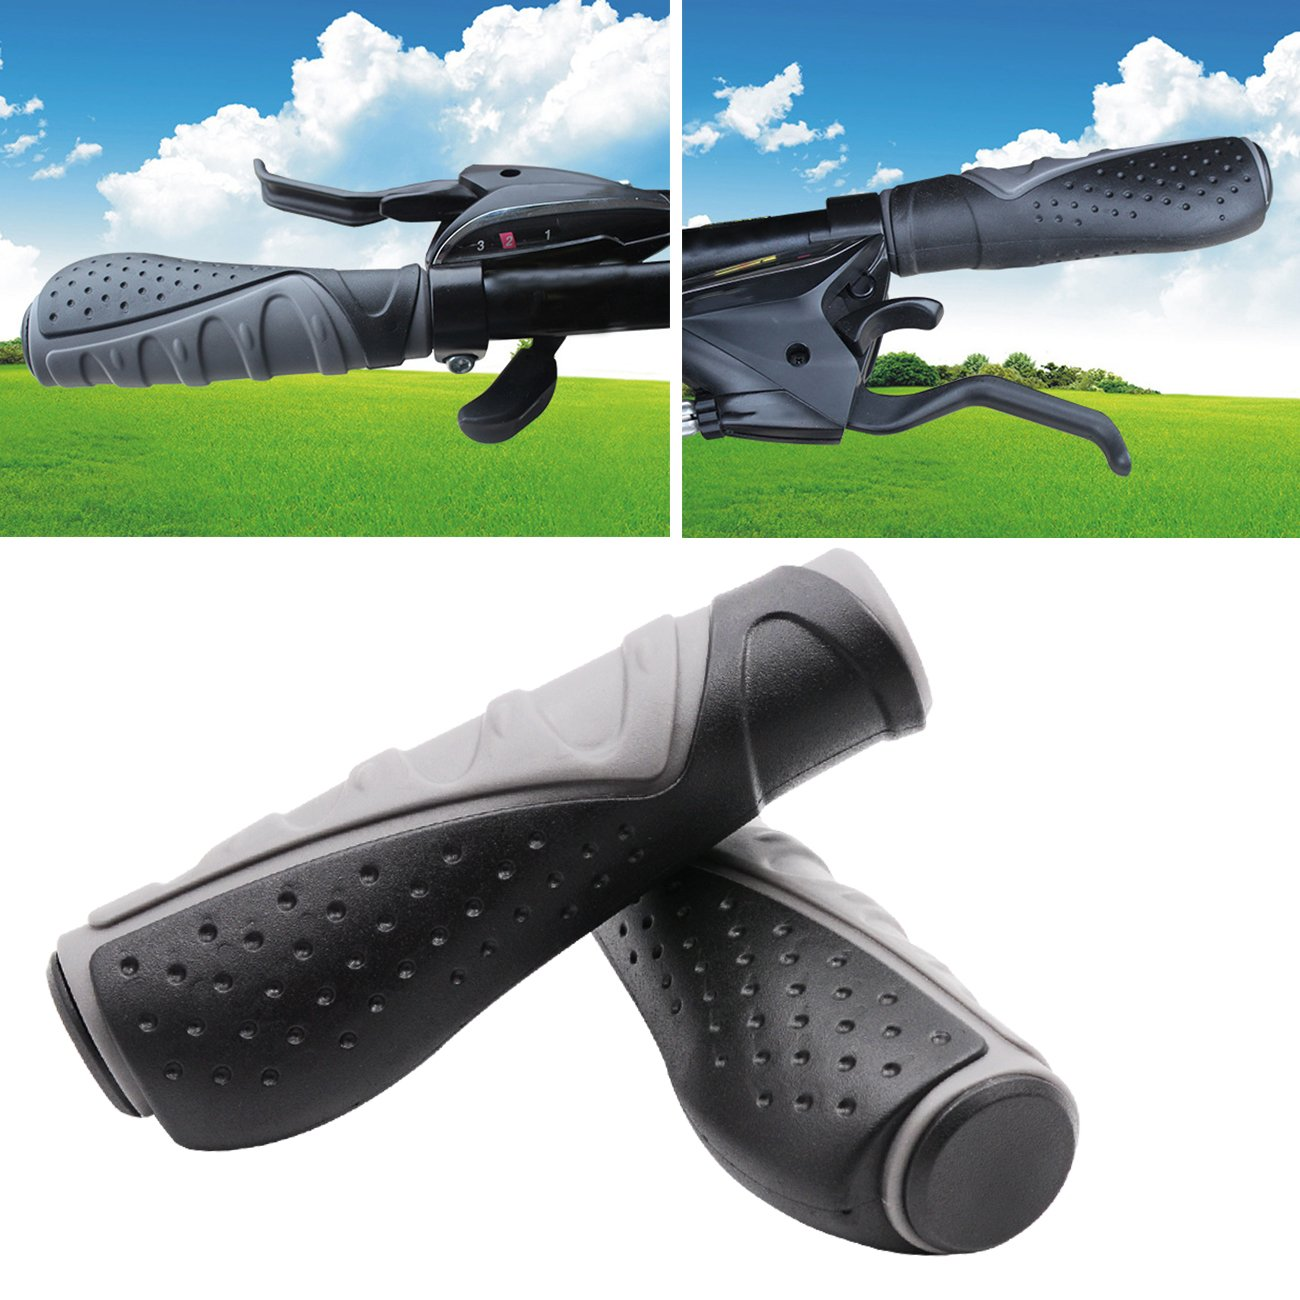 TRELC Antislip Bicycle Handlebar Grips Protector For Bicycle/ Mountain Bike/ Road Bike/ Folding Bike (Black+Grey) by TRELC (Image #5)